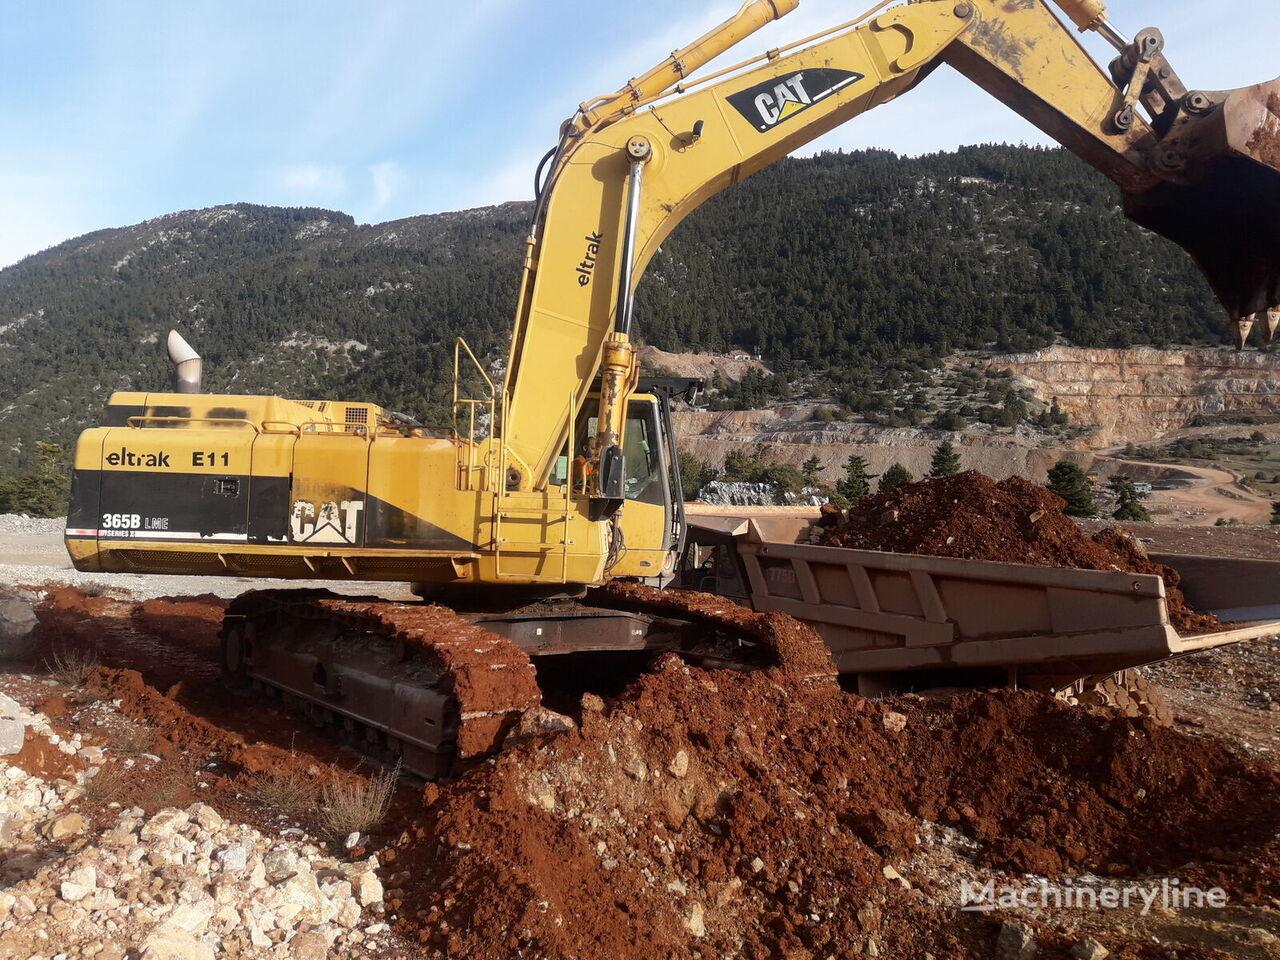 CATERPILLAR 365BLME II excavadora de cadenas